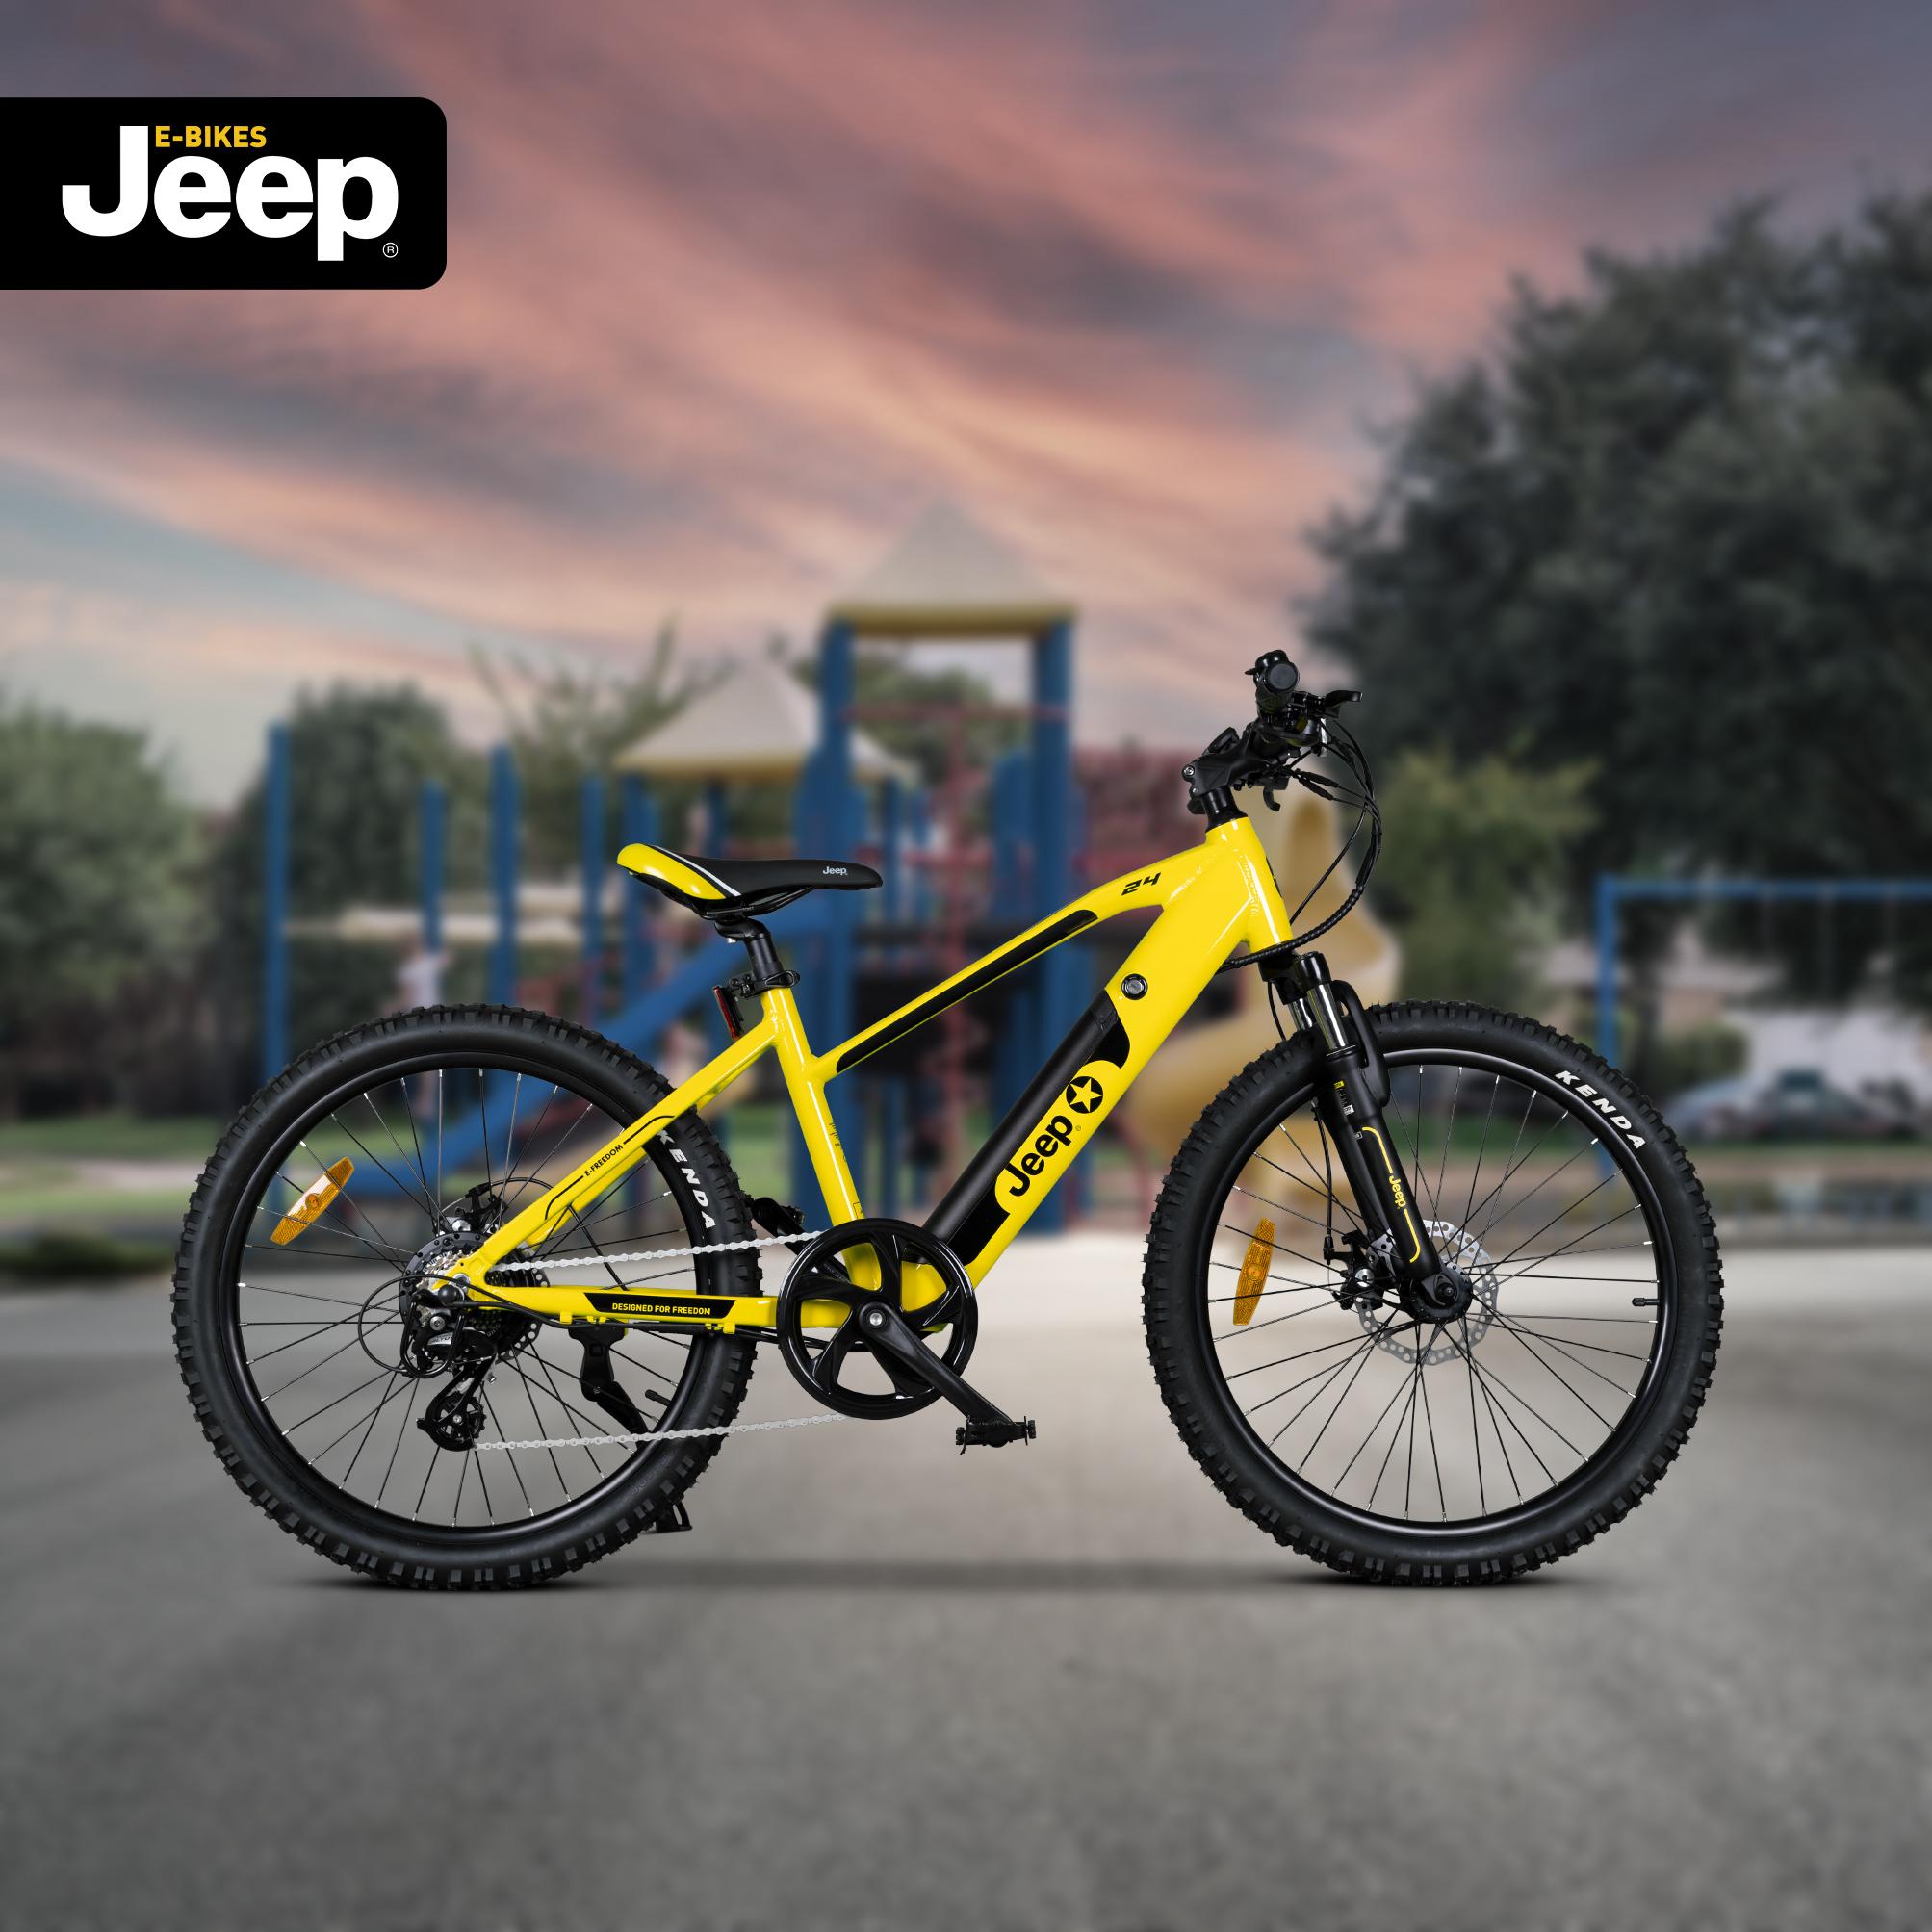 PI vom 17.02.2021 | Jeep Teen E-Bike